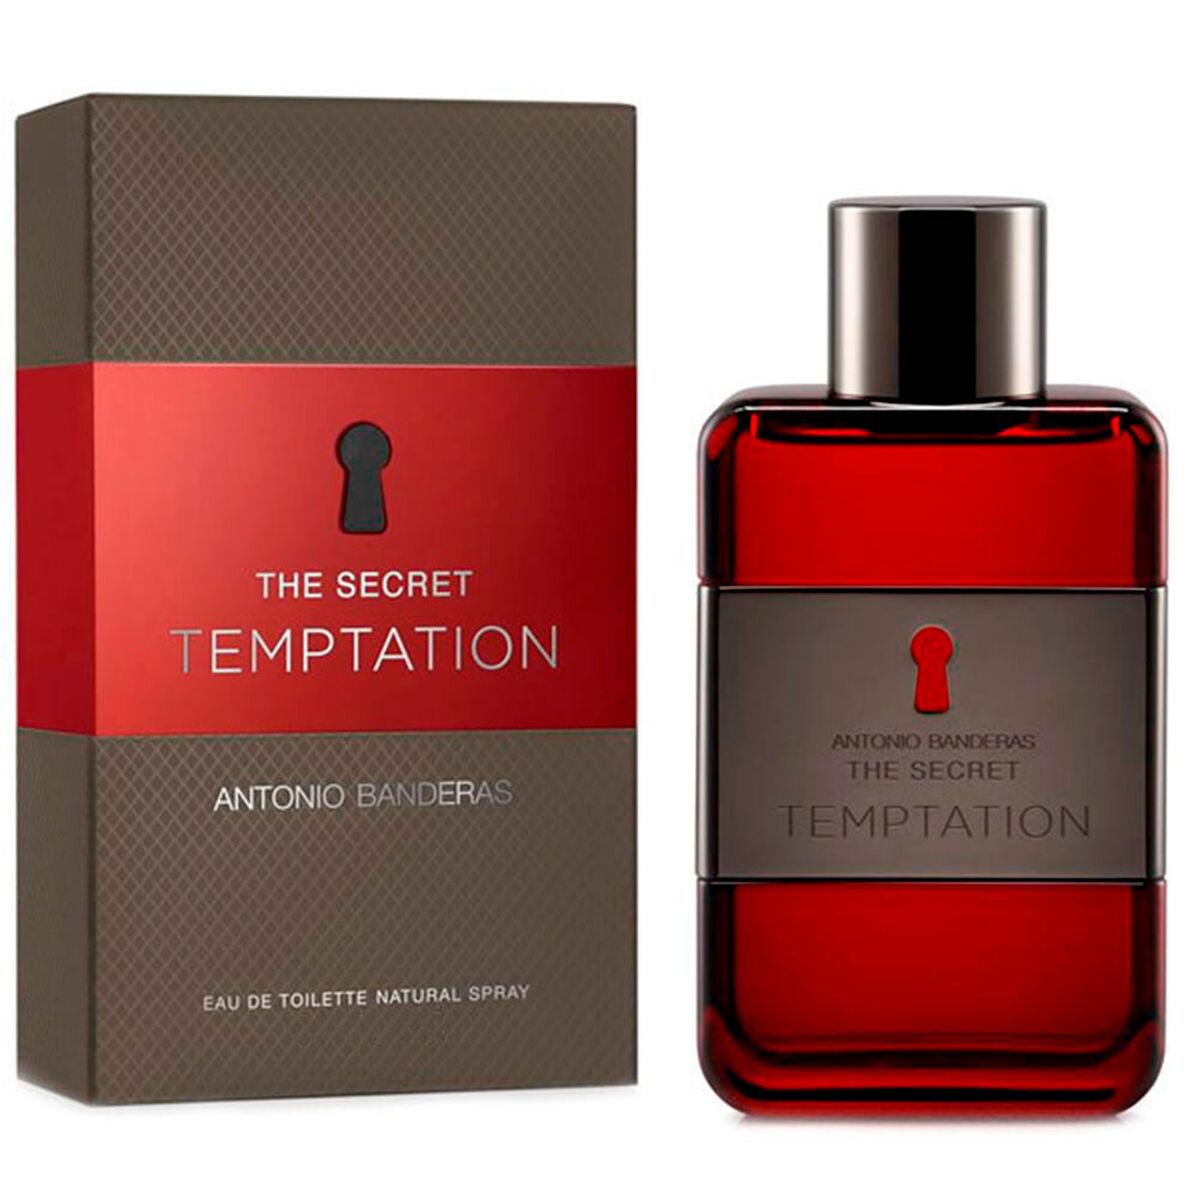 Perfume Antonio Banderas Her Secret Tempation 80 ml